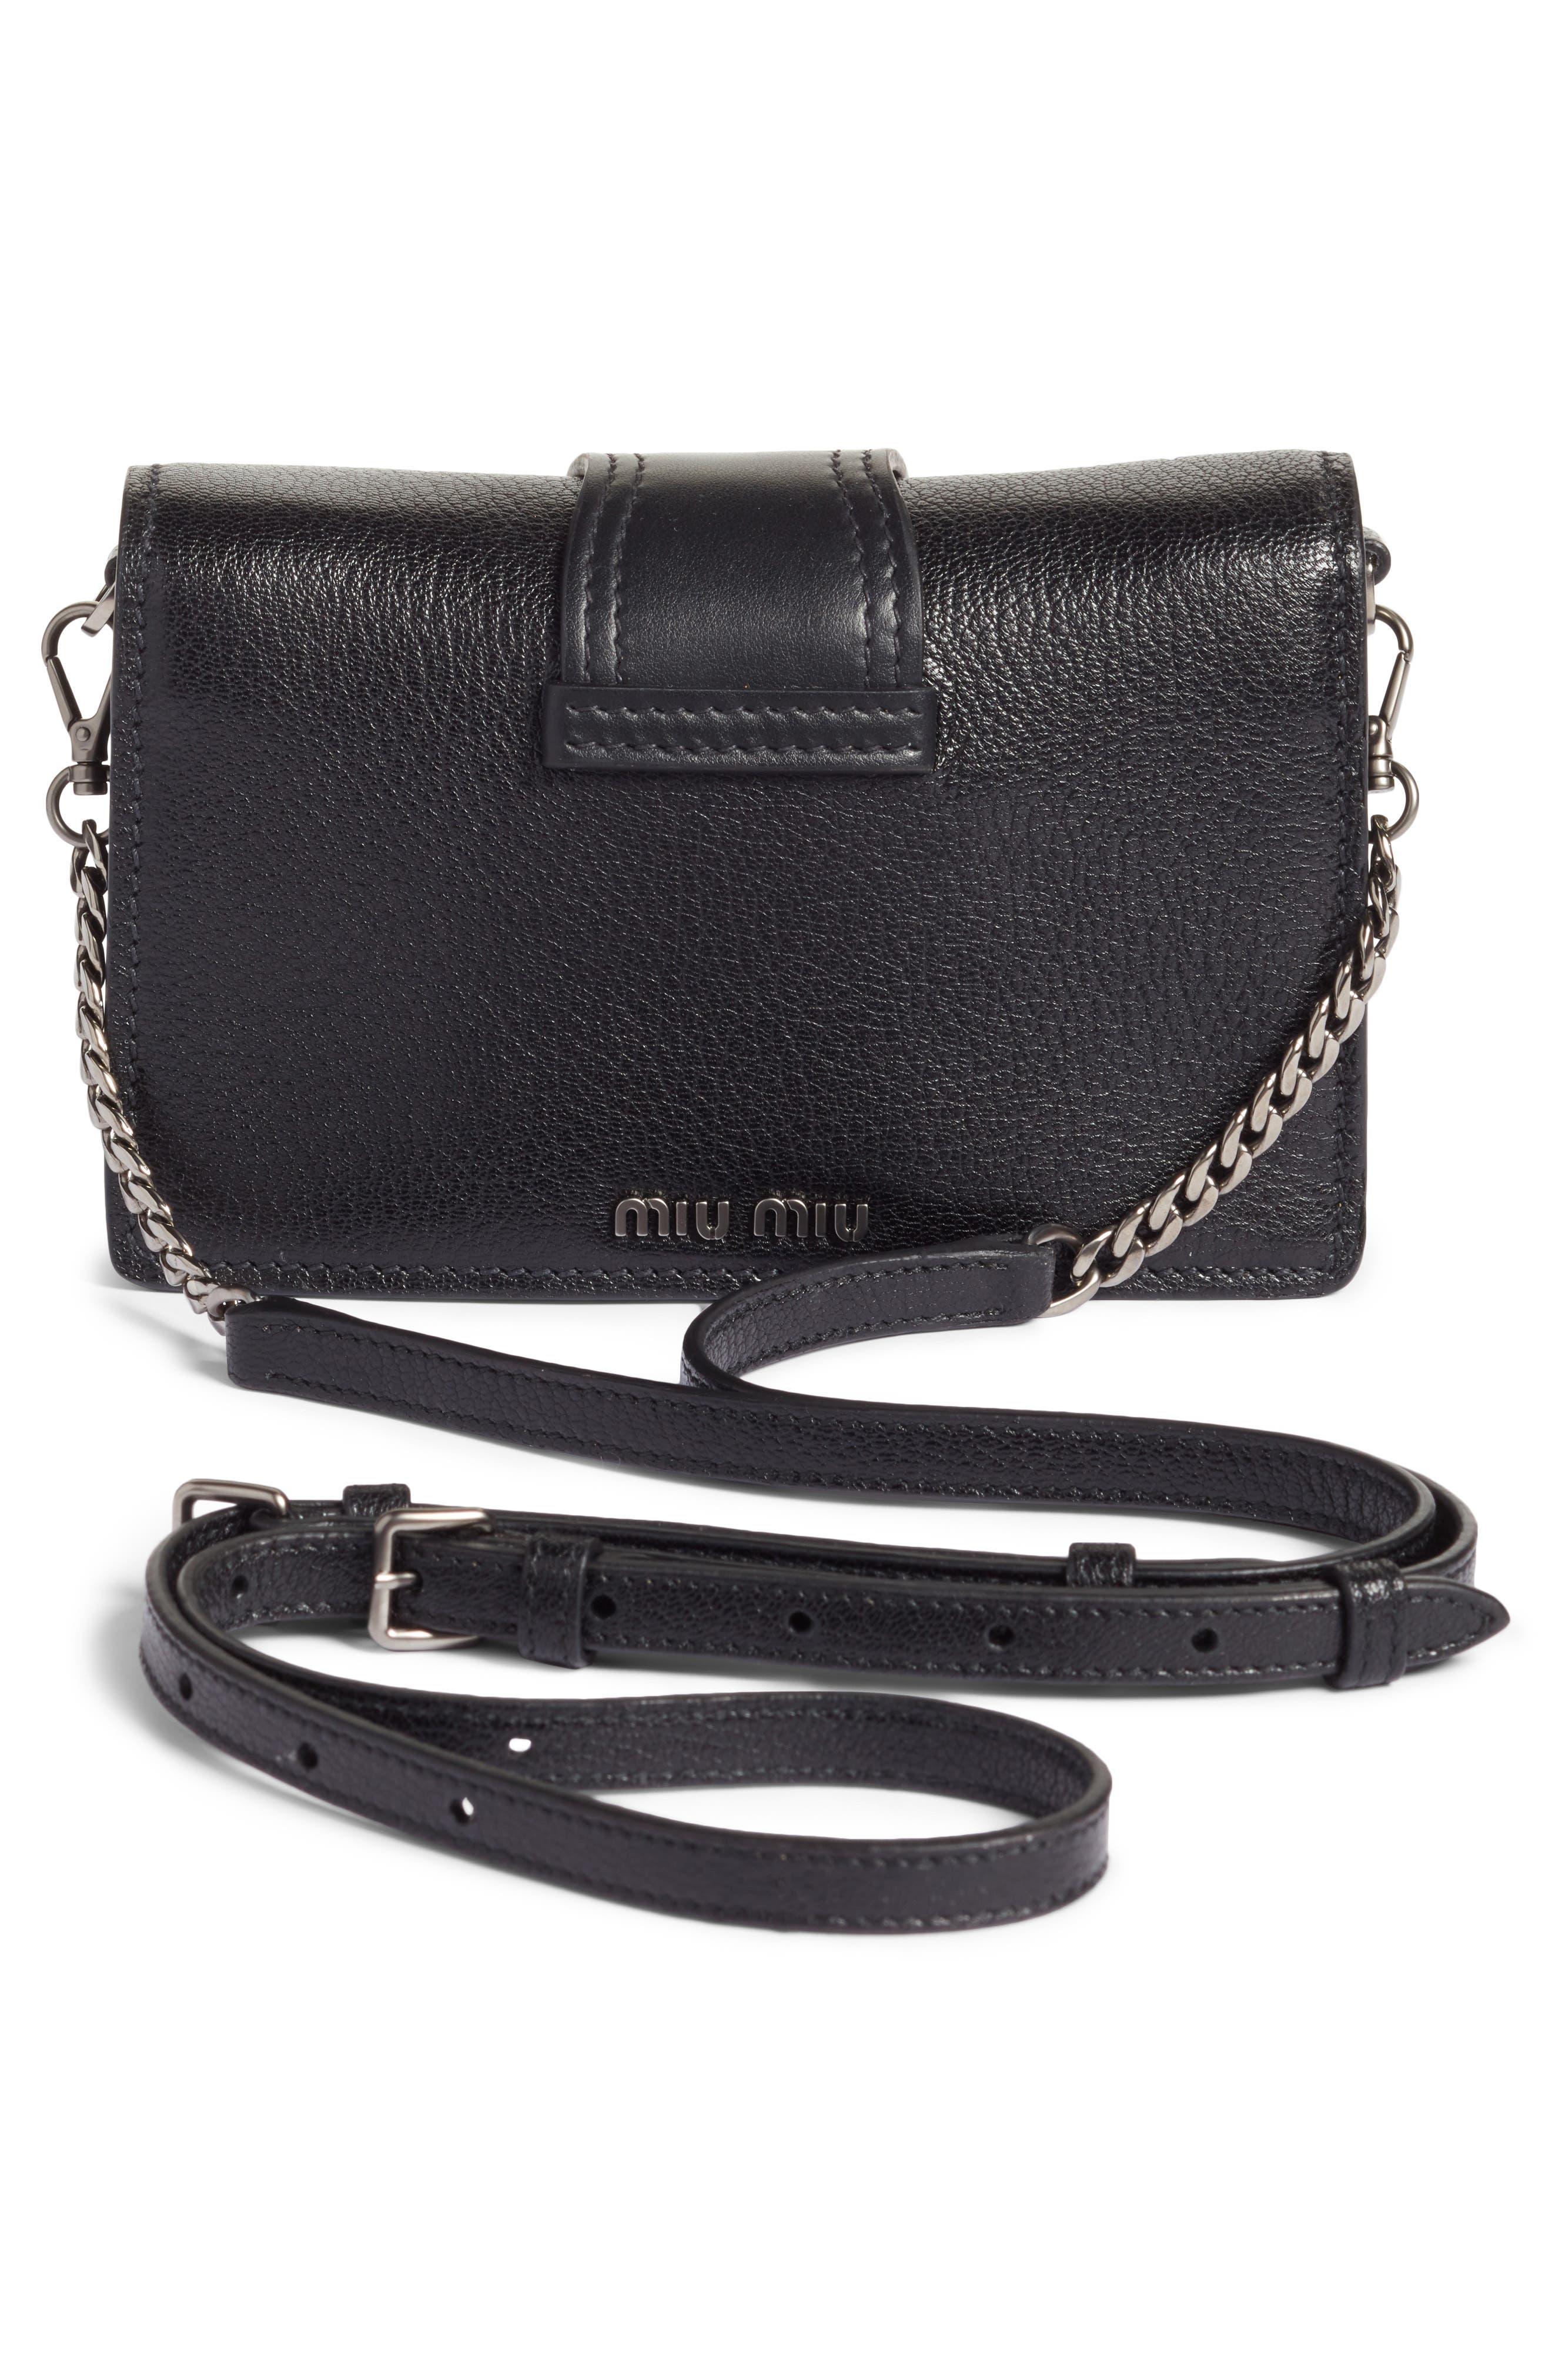 Lady Madras Crystal Embellished Leather Crossbody Bag,                             Alternate thumbnail 3, color,                             Nero 1